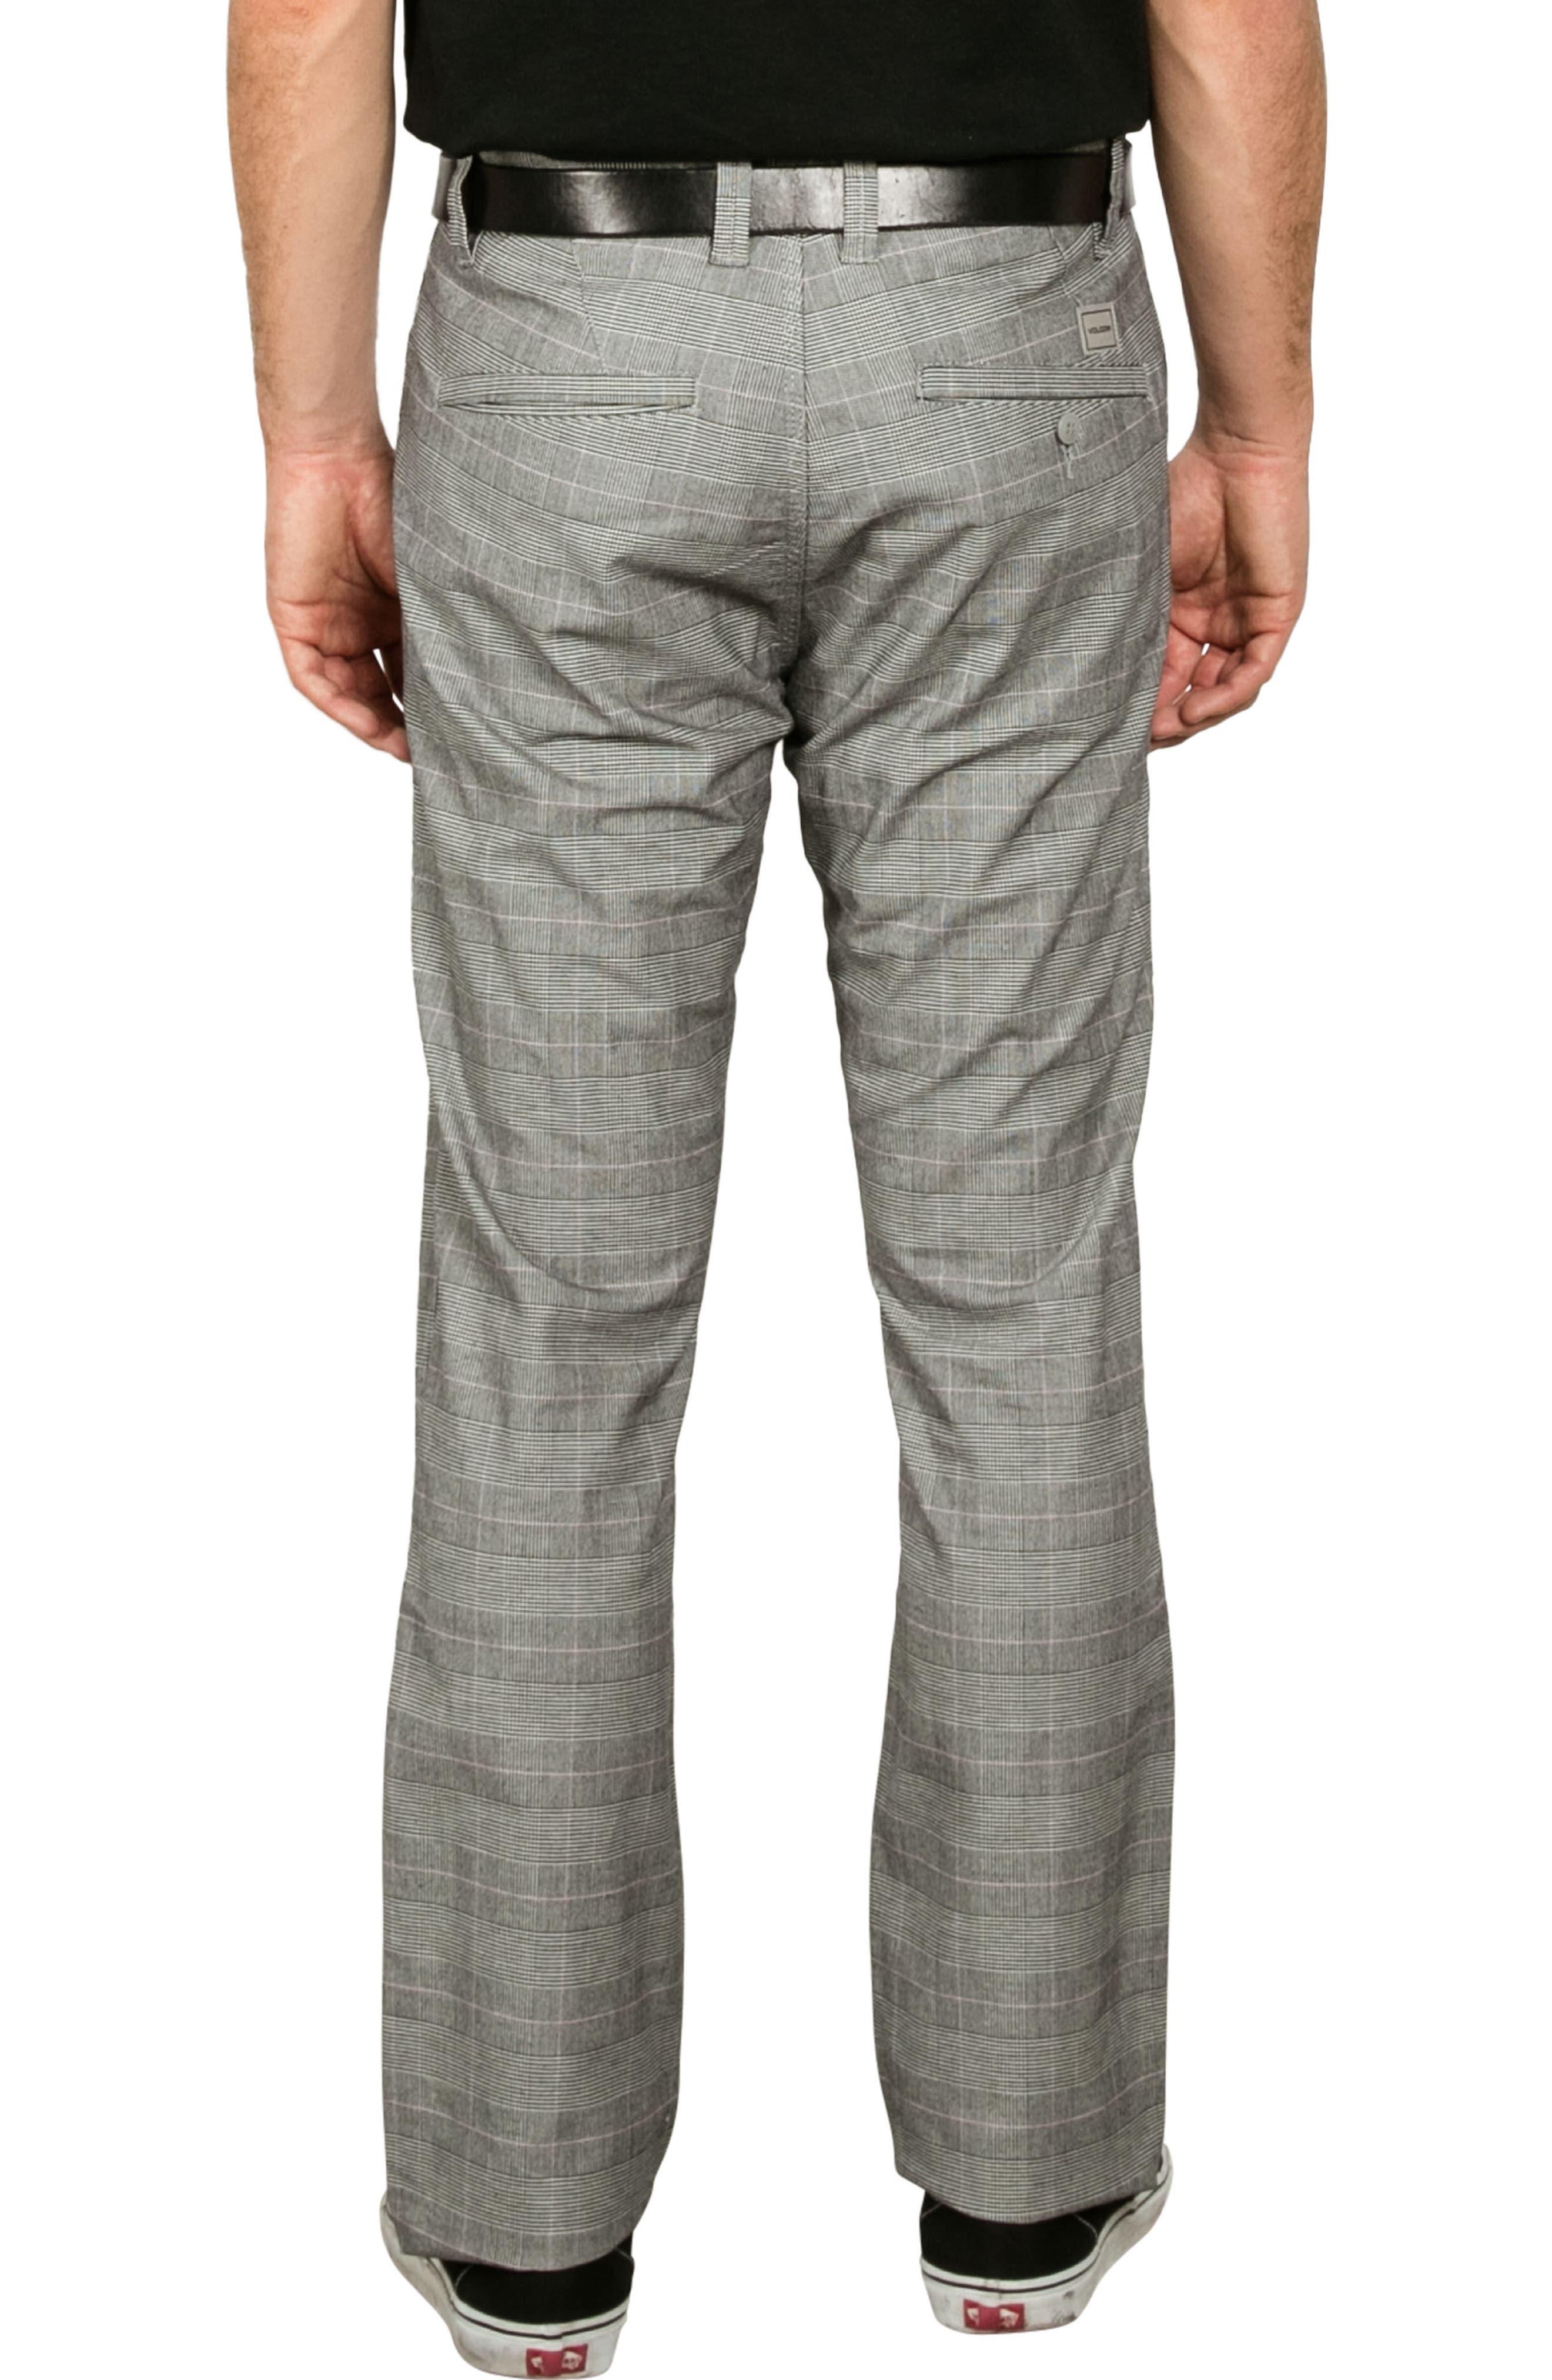 Gritter Modern Thrifter Pants,                             Alternate thumbnail 4, color,